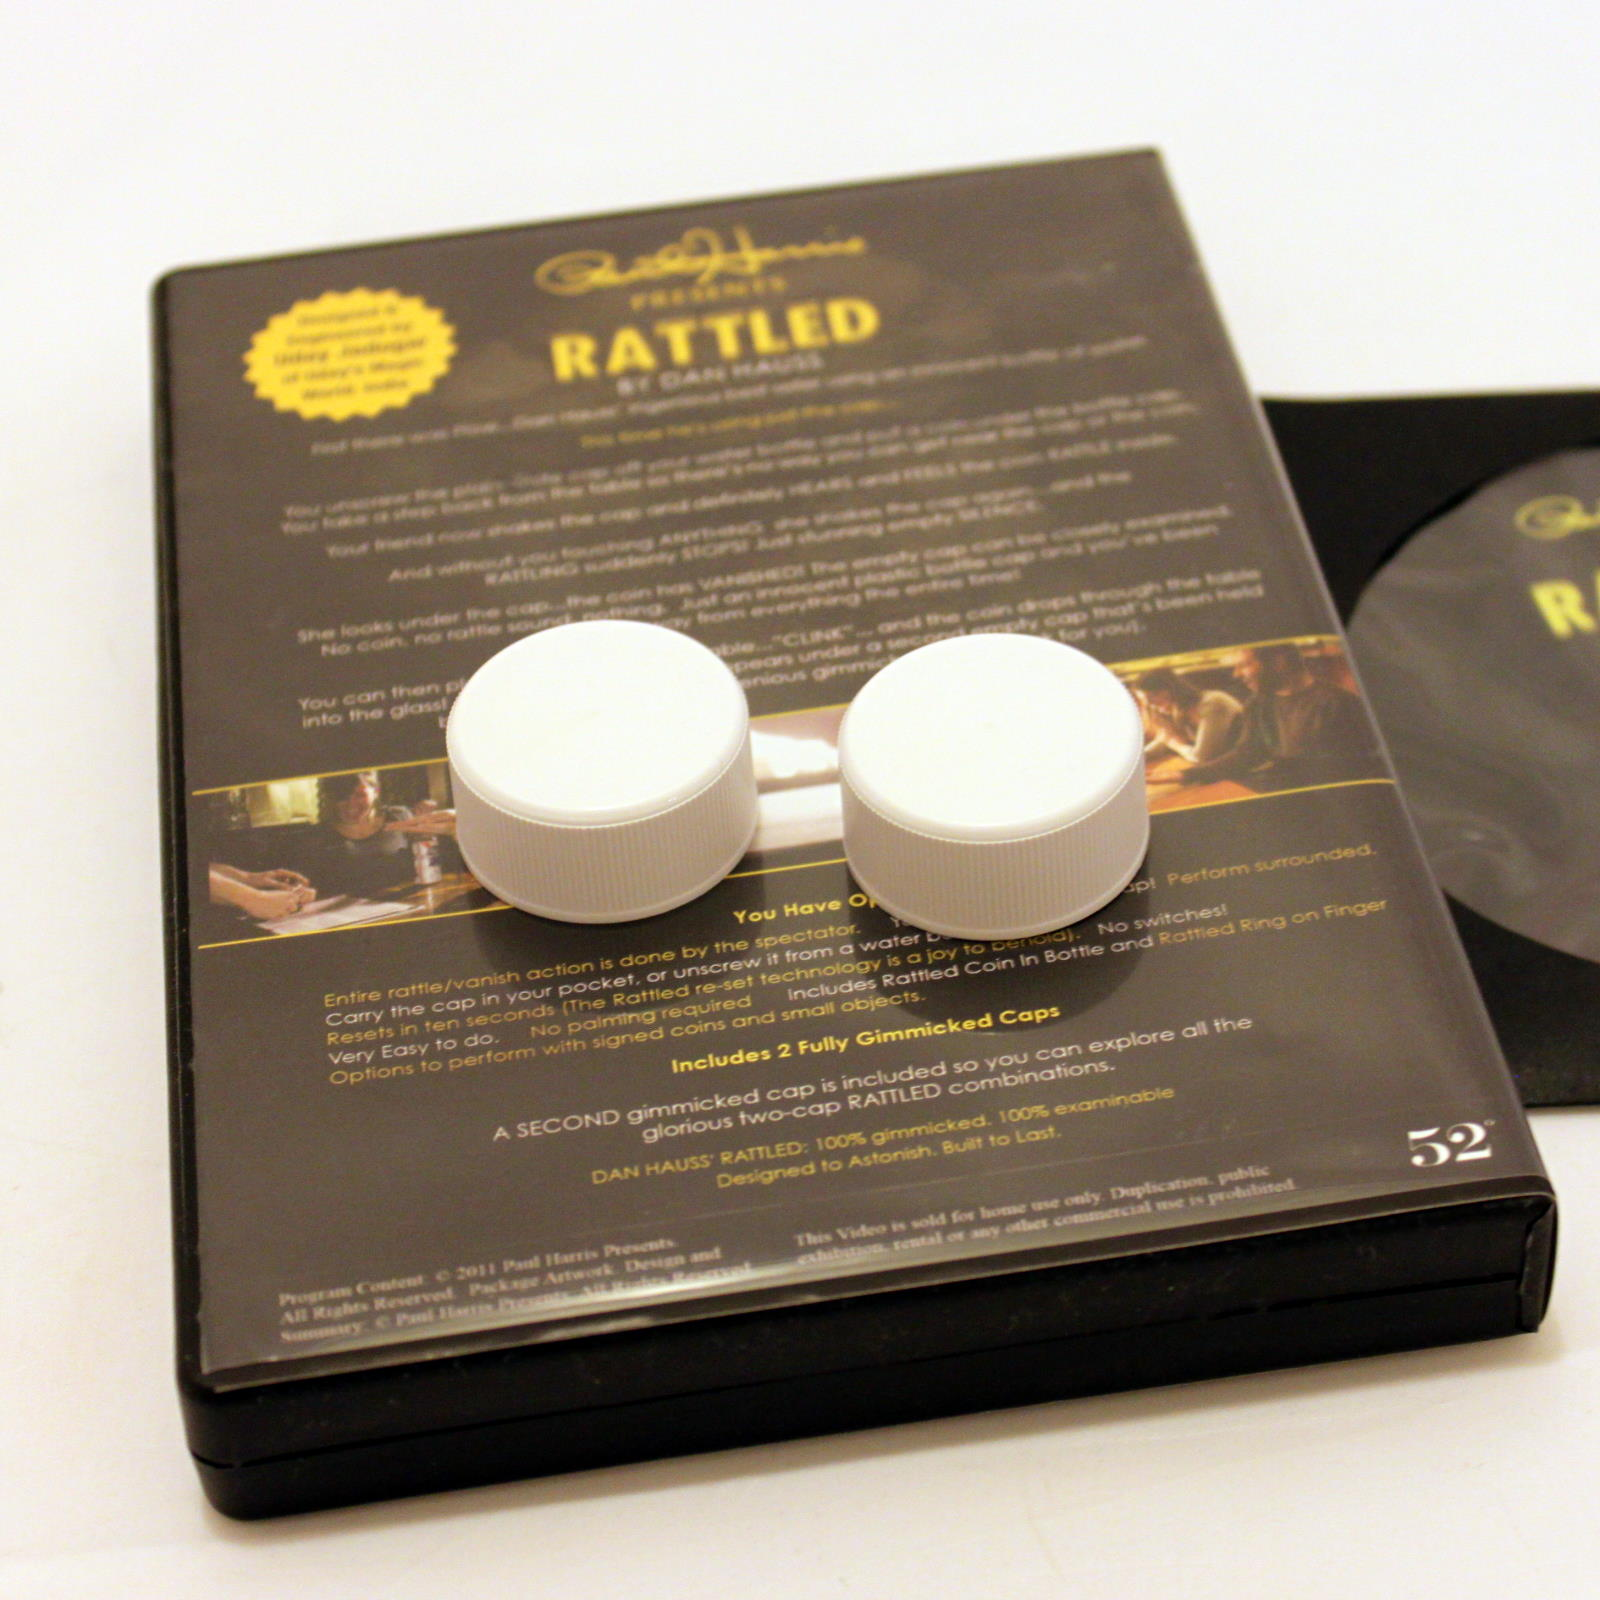 Dan Haus rattled dvd gimmick by dan hauss martin s magic collection